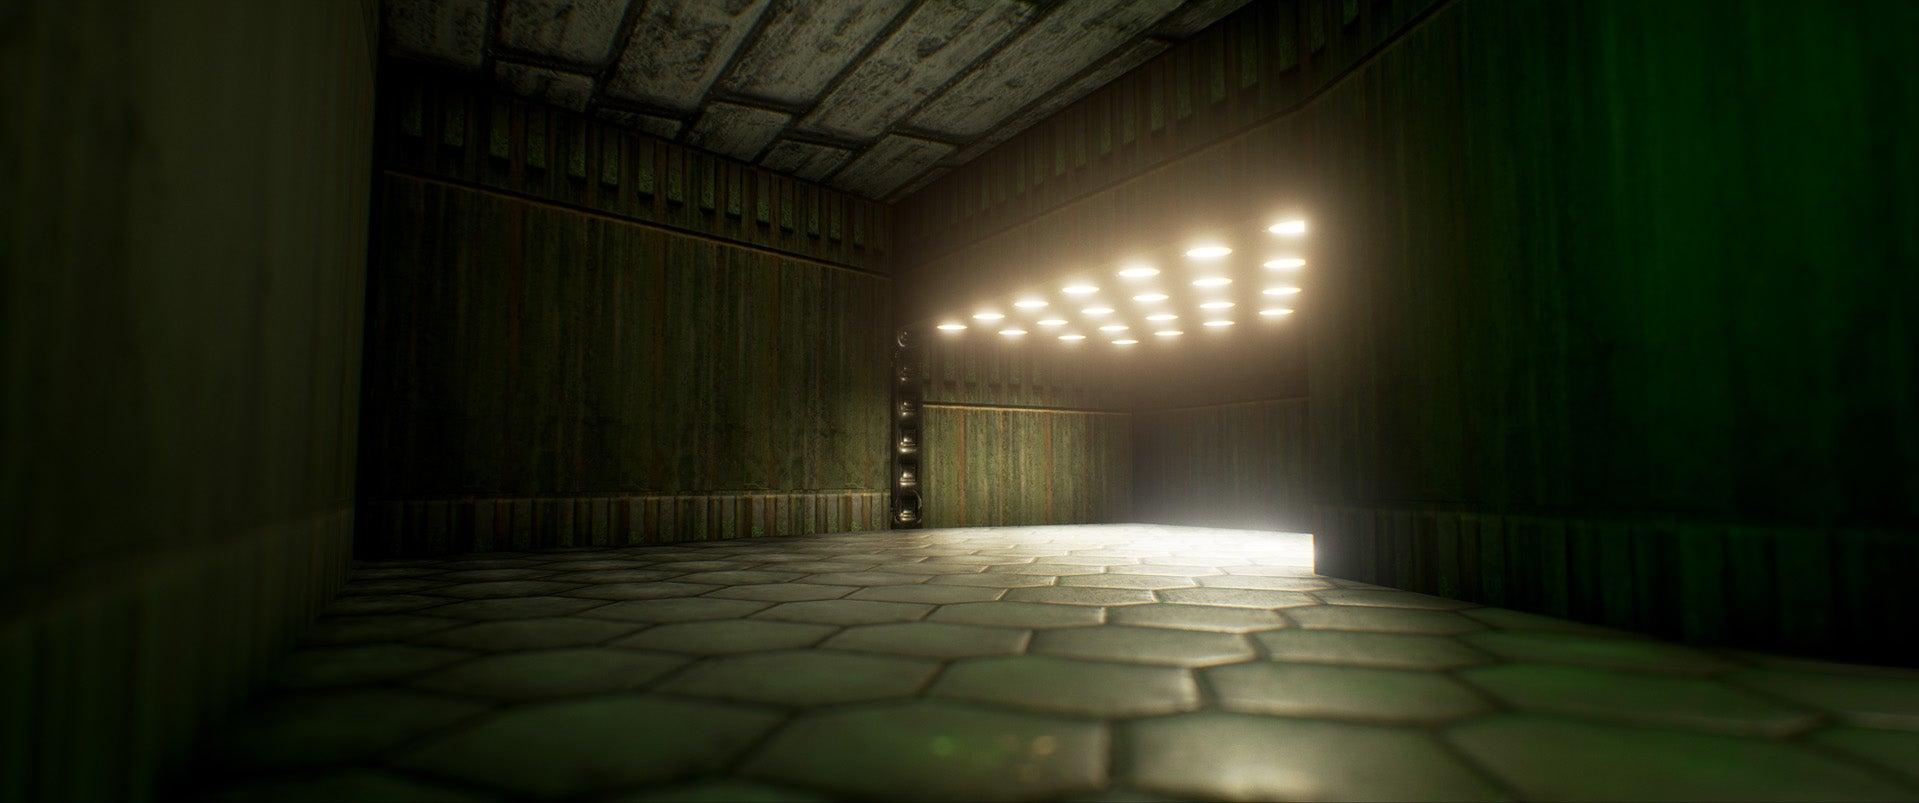 Unreal Engine 4 Makes Doom Very, Uh, Angular